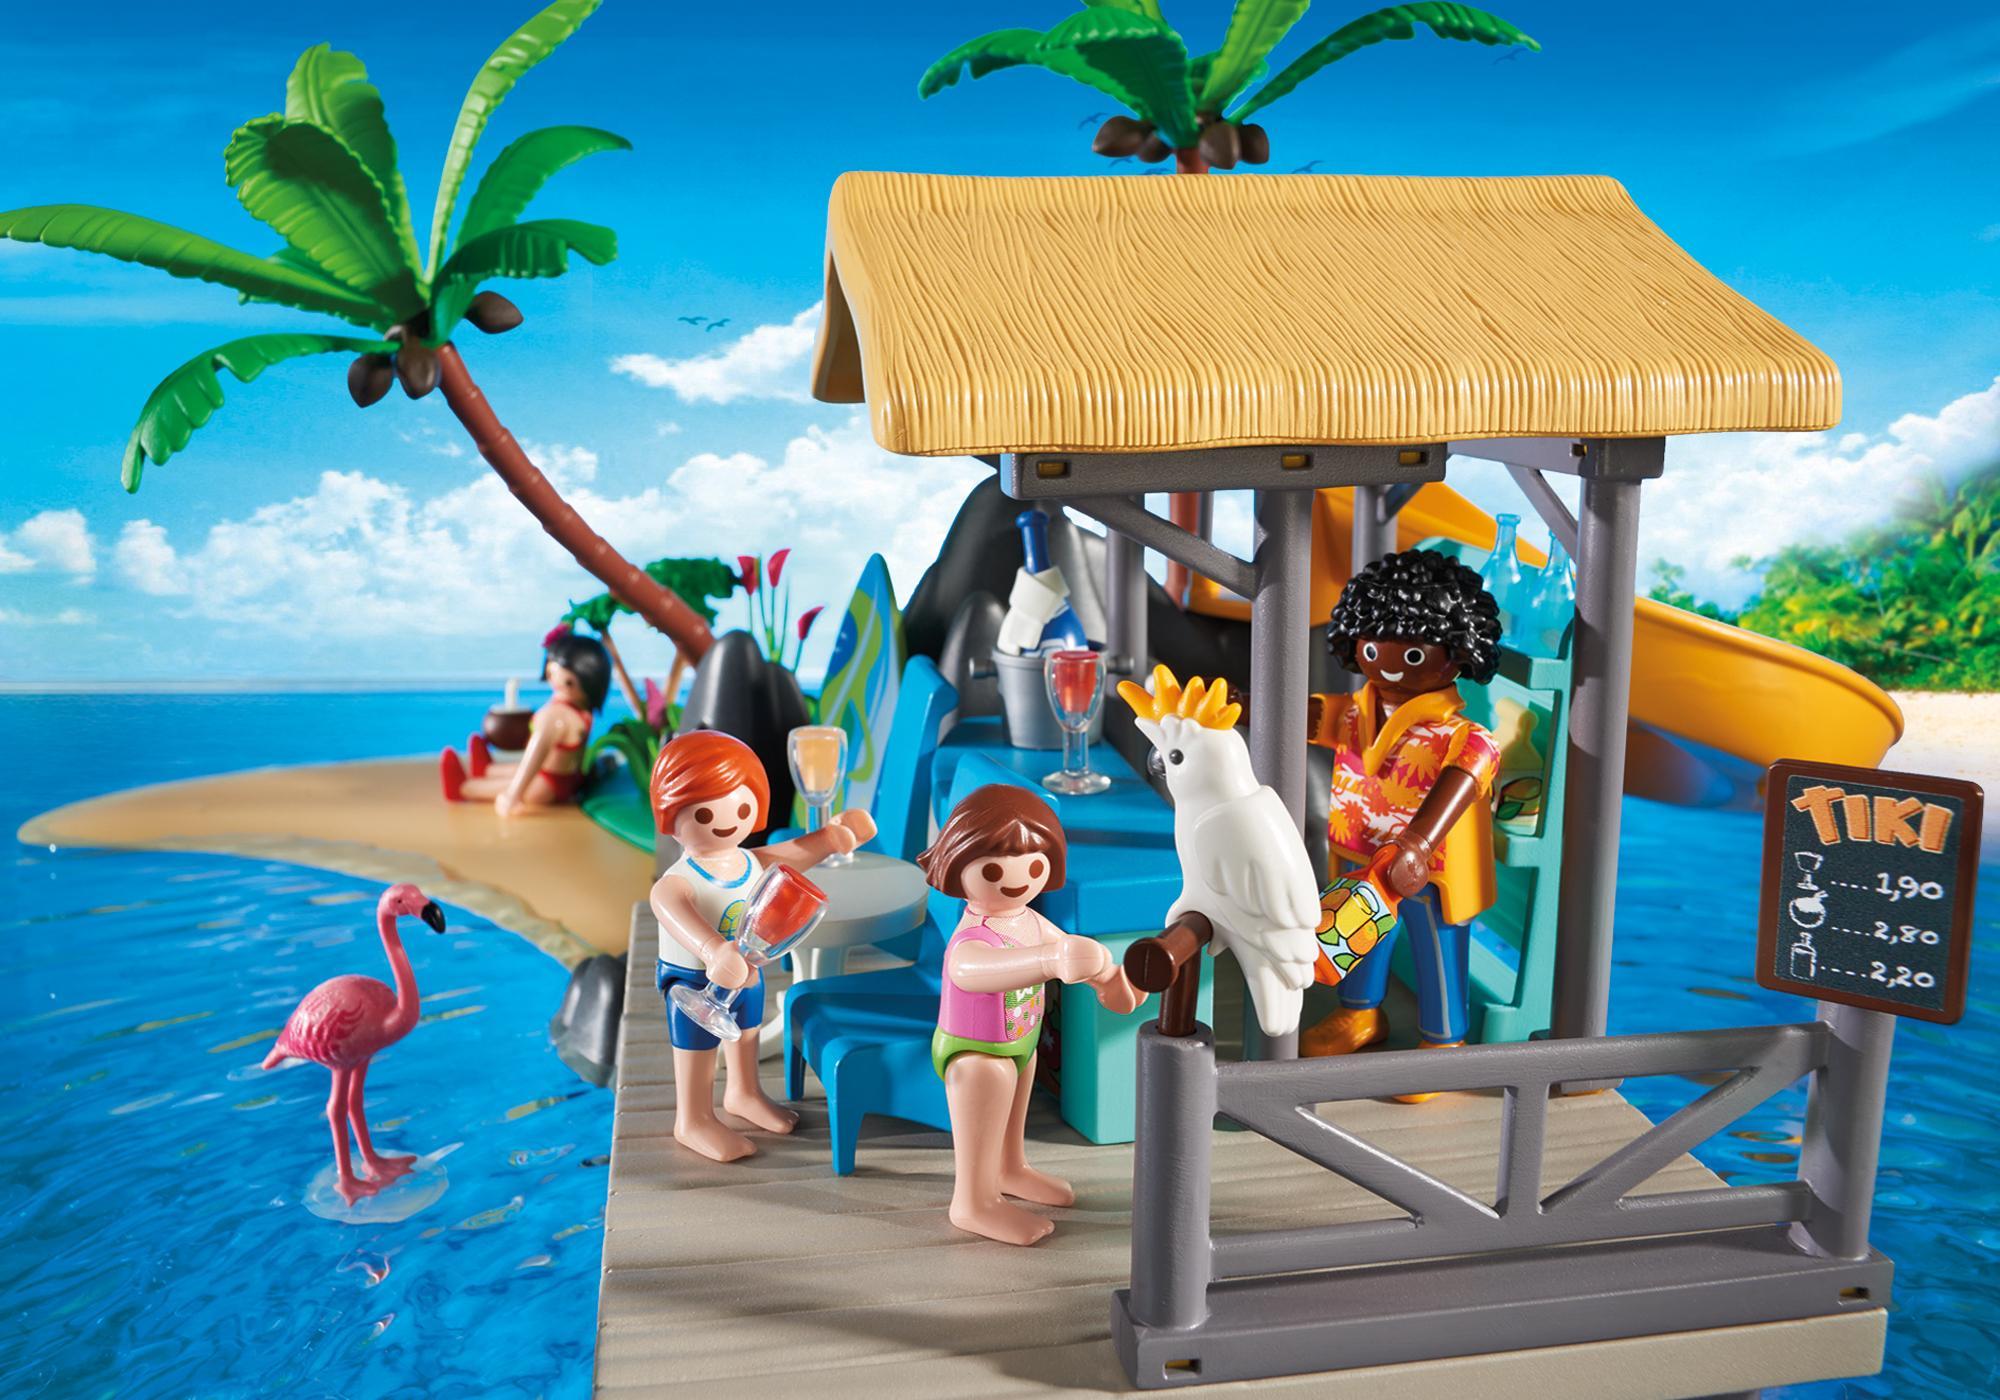 http://media.playmobil.com/i/playmobil/6979_product_extra2/Island Juice Bar